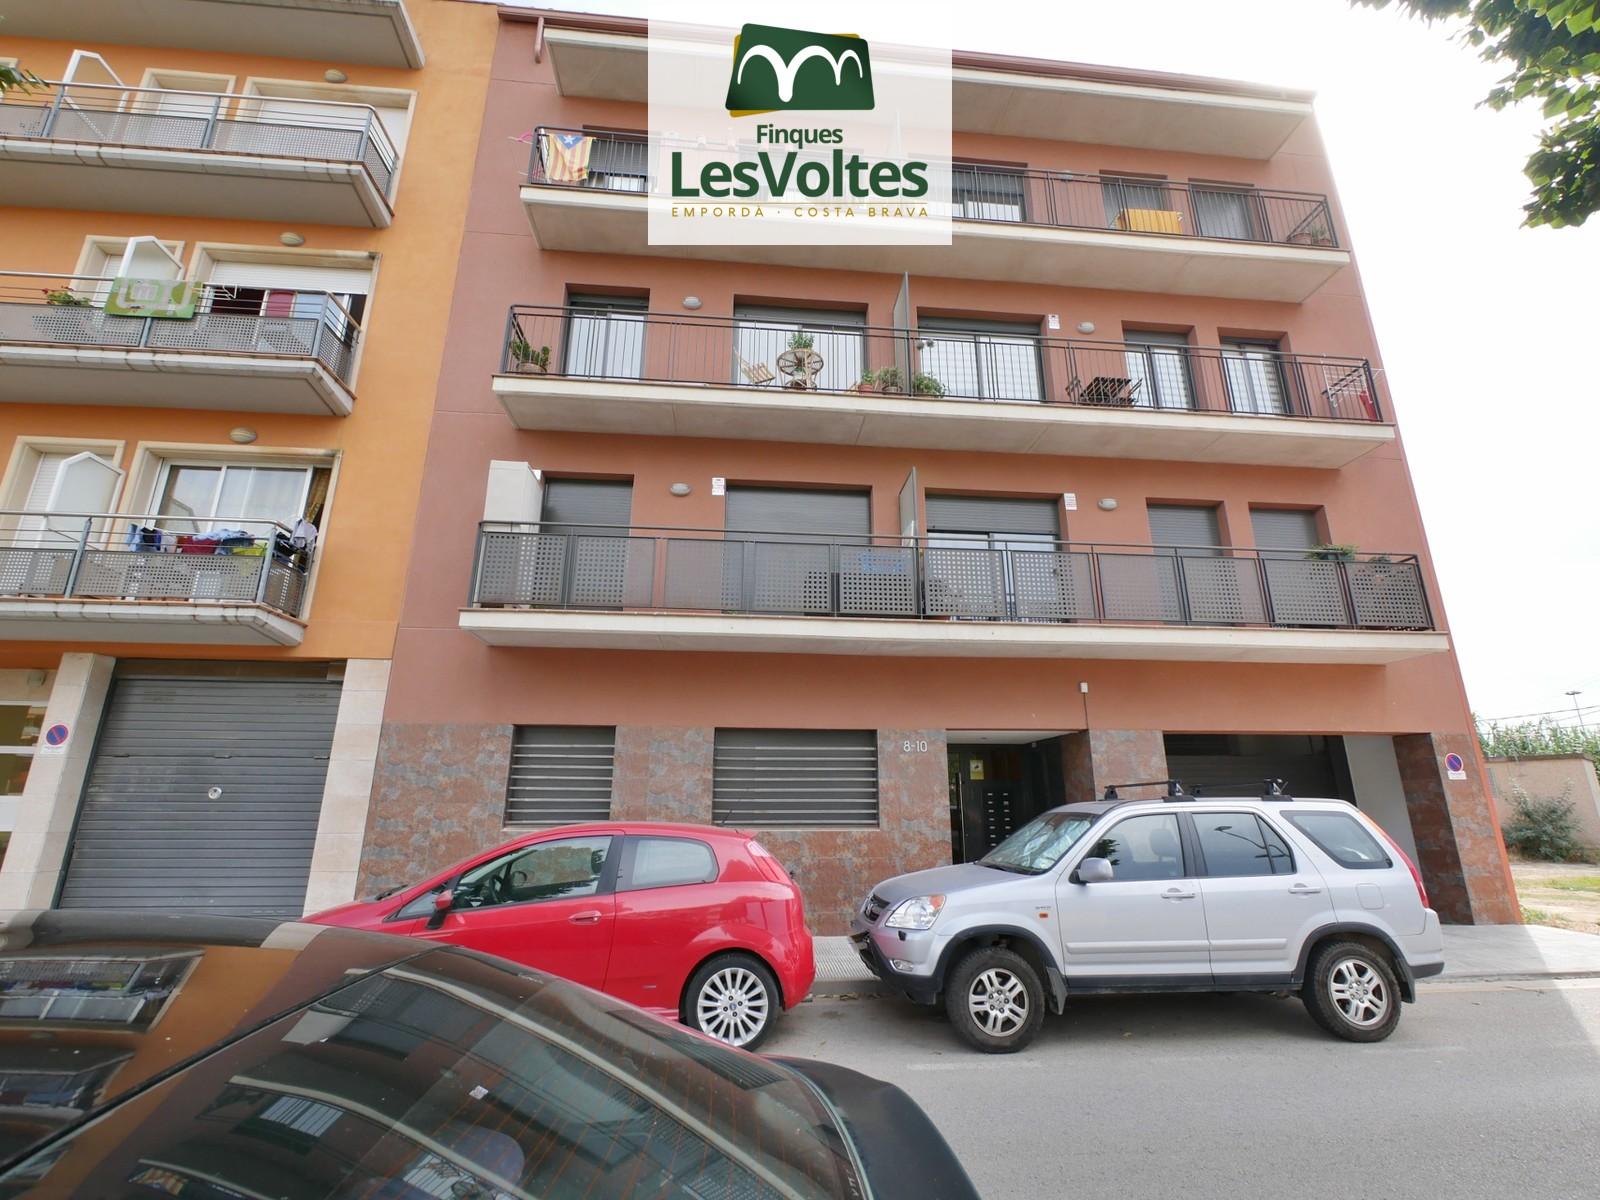 51 M2 GROUND FLOOR WITH 1 BEDROOM AND PARKING FOR RENT IN LA BISBAL D'EMPORDÀ.